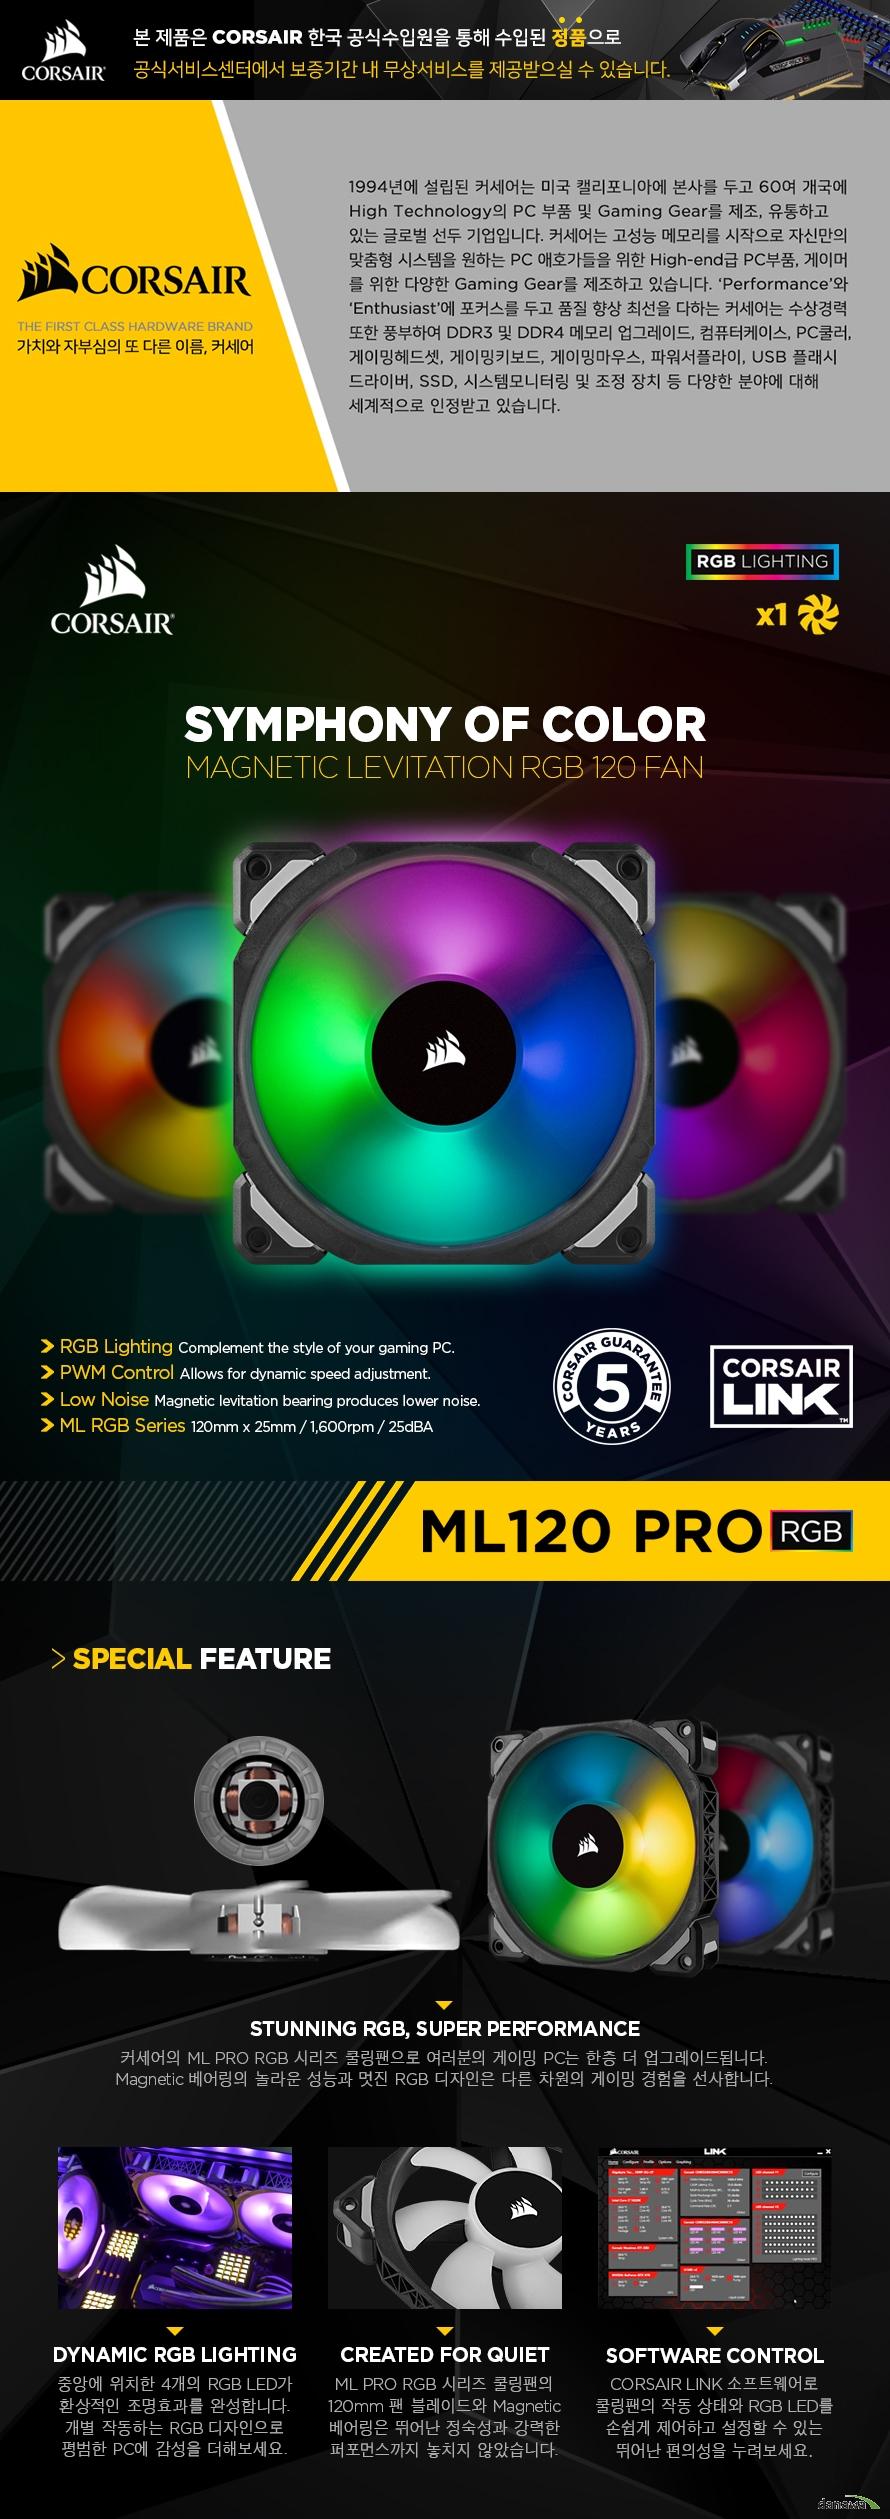 CORSAIR ML PRO 120 RGB 커세어의 ML PRO RGB 시리즈 쿨링팬으로 여러분의 게이밍 PC는 한층 더 업그레이드됩니다. 놀라운 성능과 PC의 멋진 외관을 완성하는 디자인은 다른 차원의 게이밍 경험을 선사합니다.